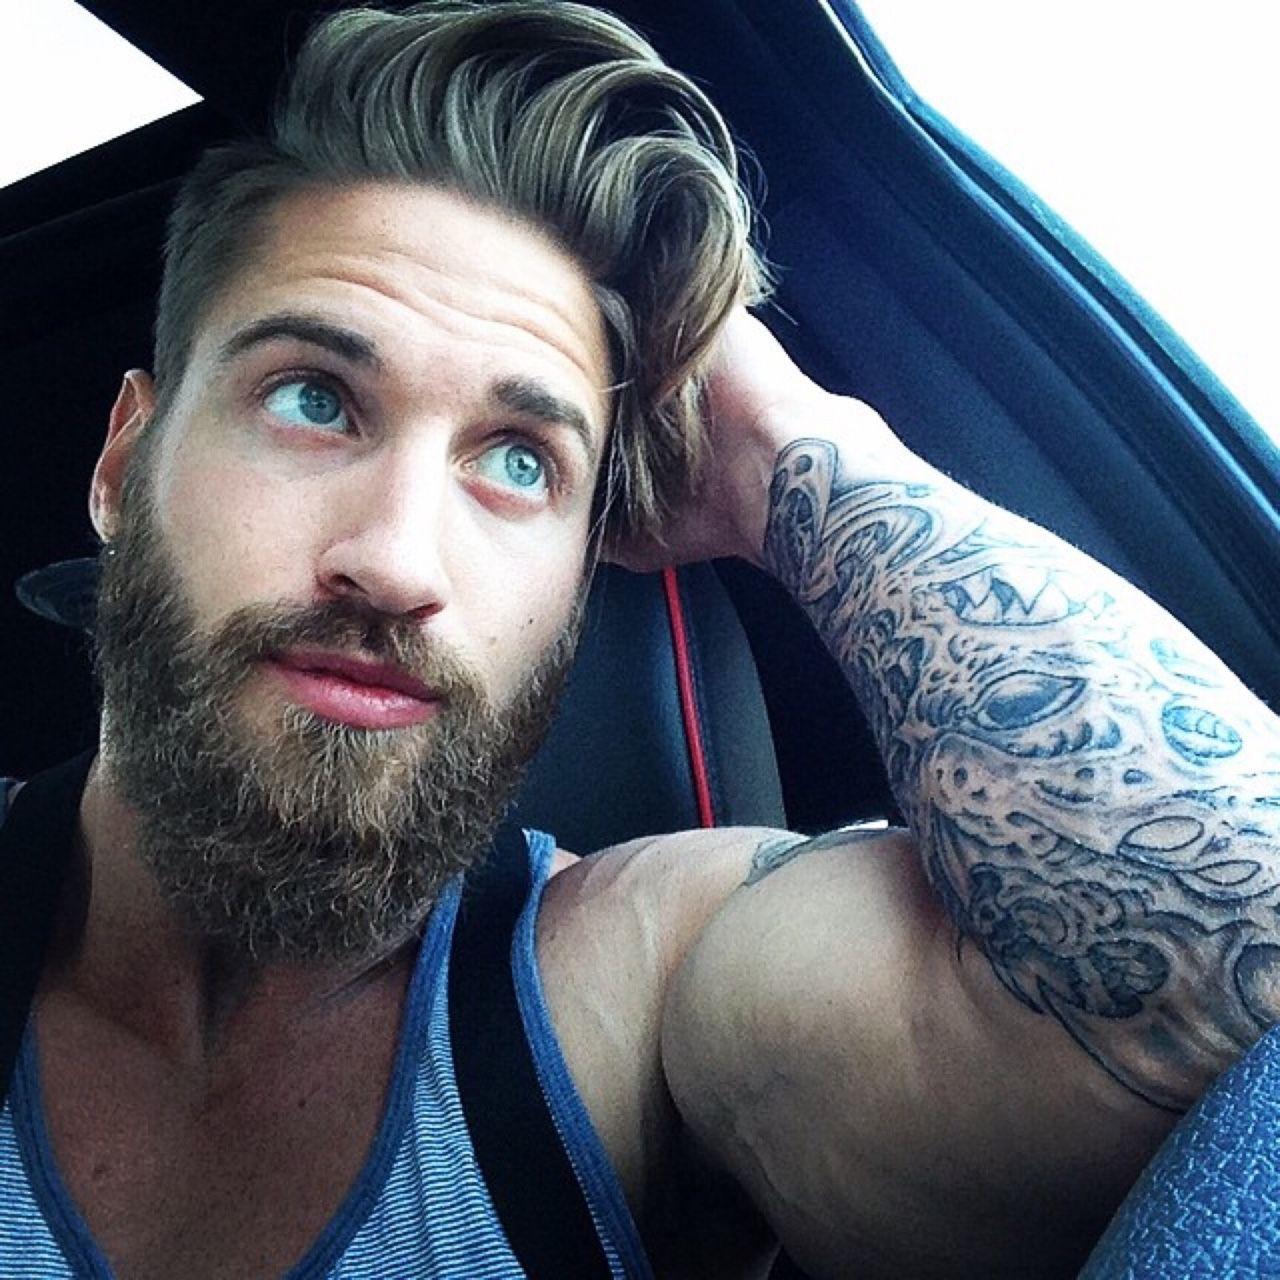 Travis deslaurier menus hair style pinterest travis deslaurier